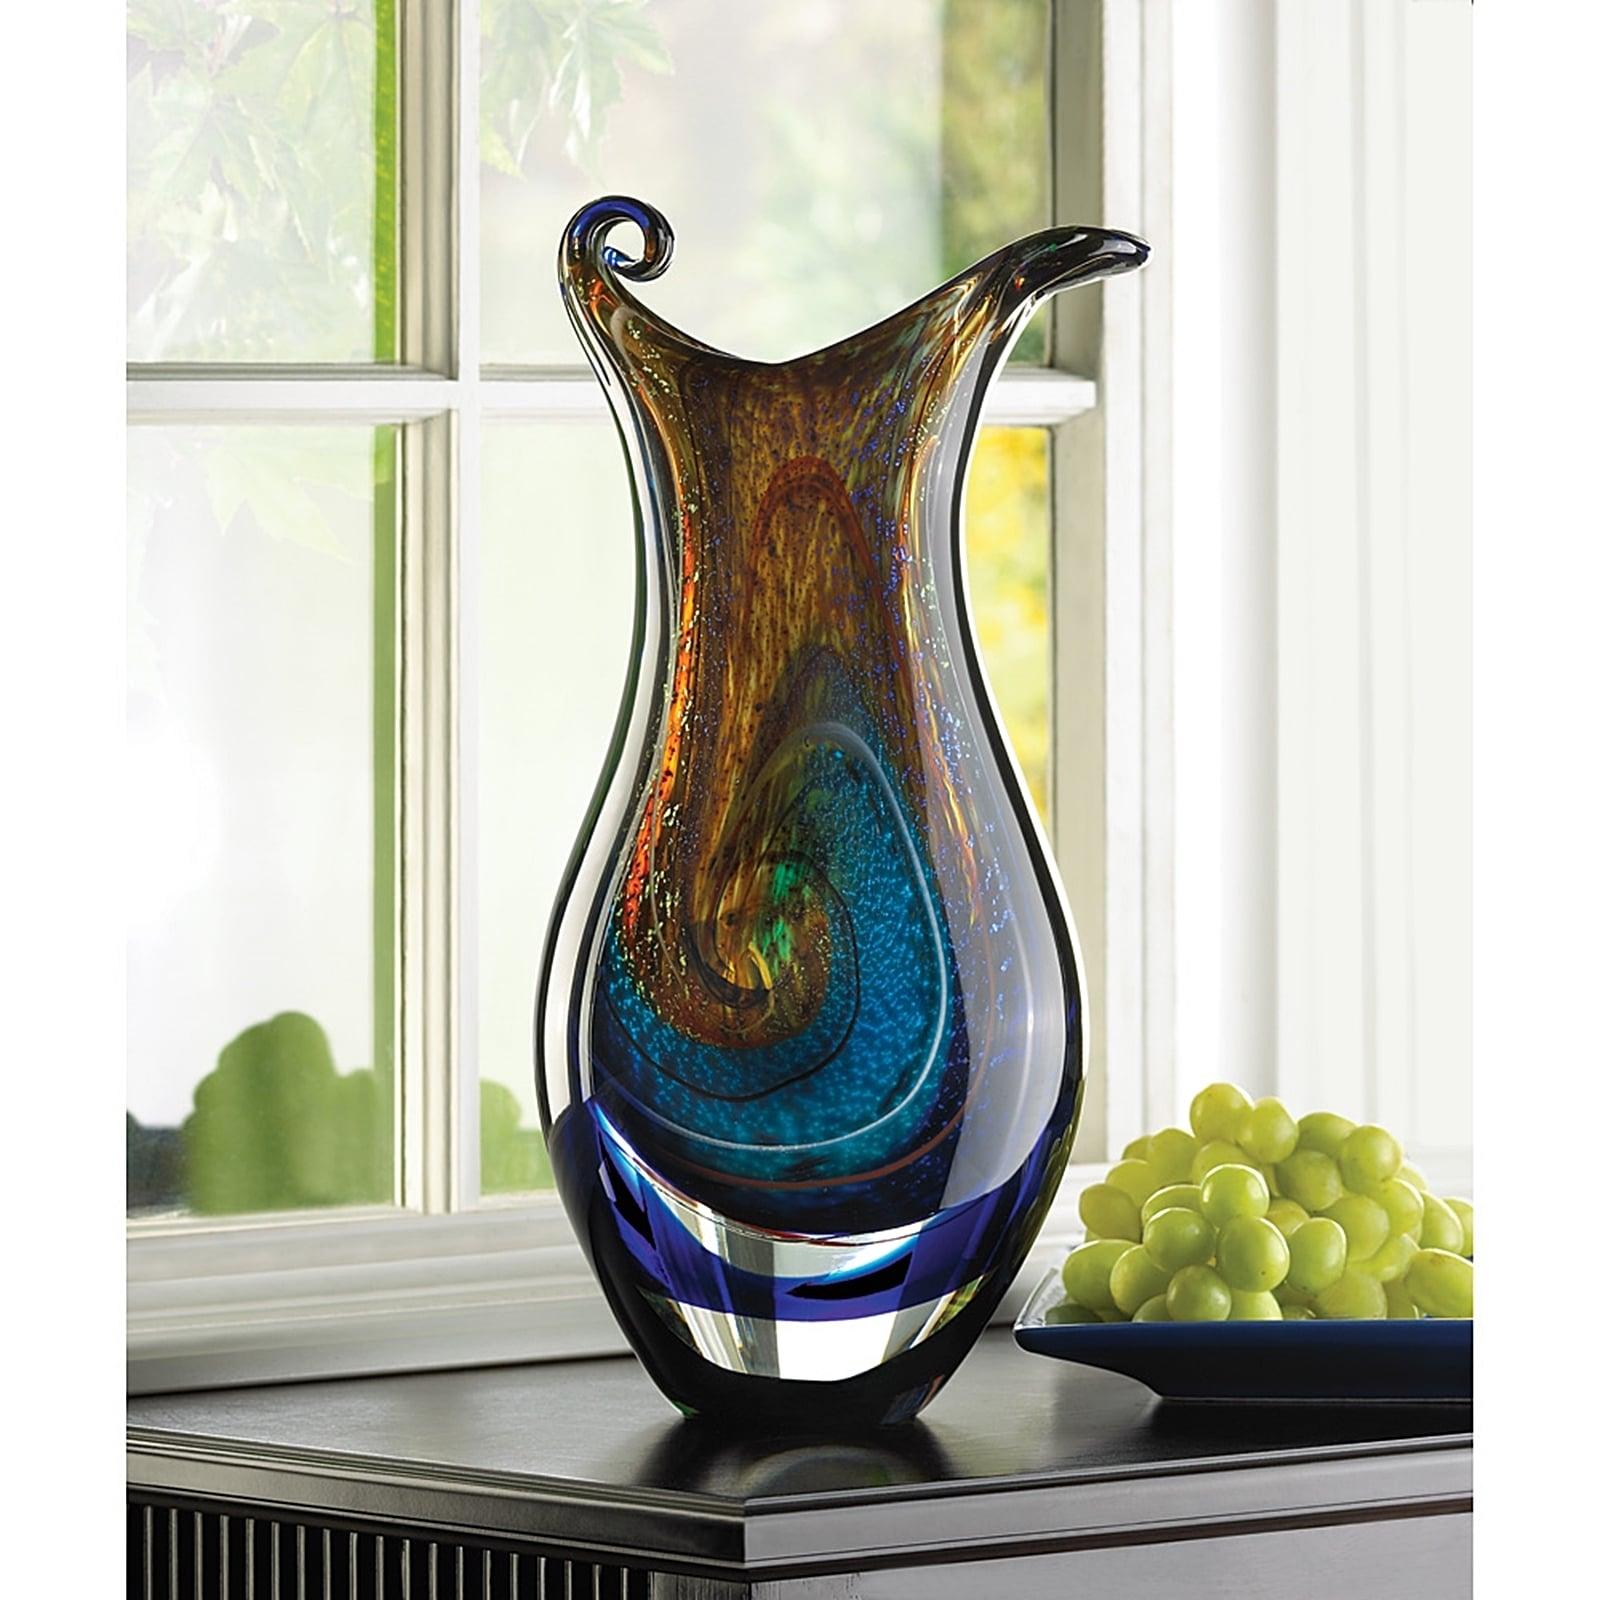 Tiffany swirl glass vase free shipping today overstock tiffany swirl glass vase free shipping today overstock 17932343 reviewsmspy